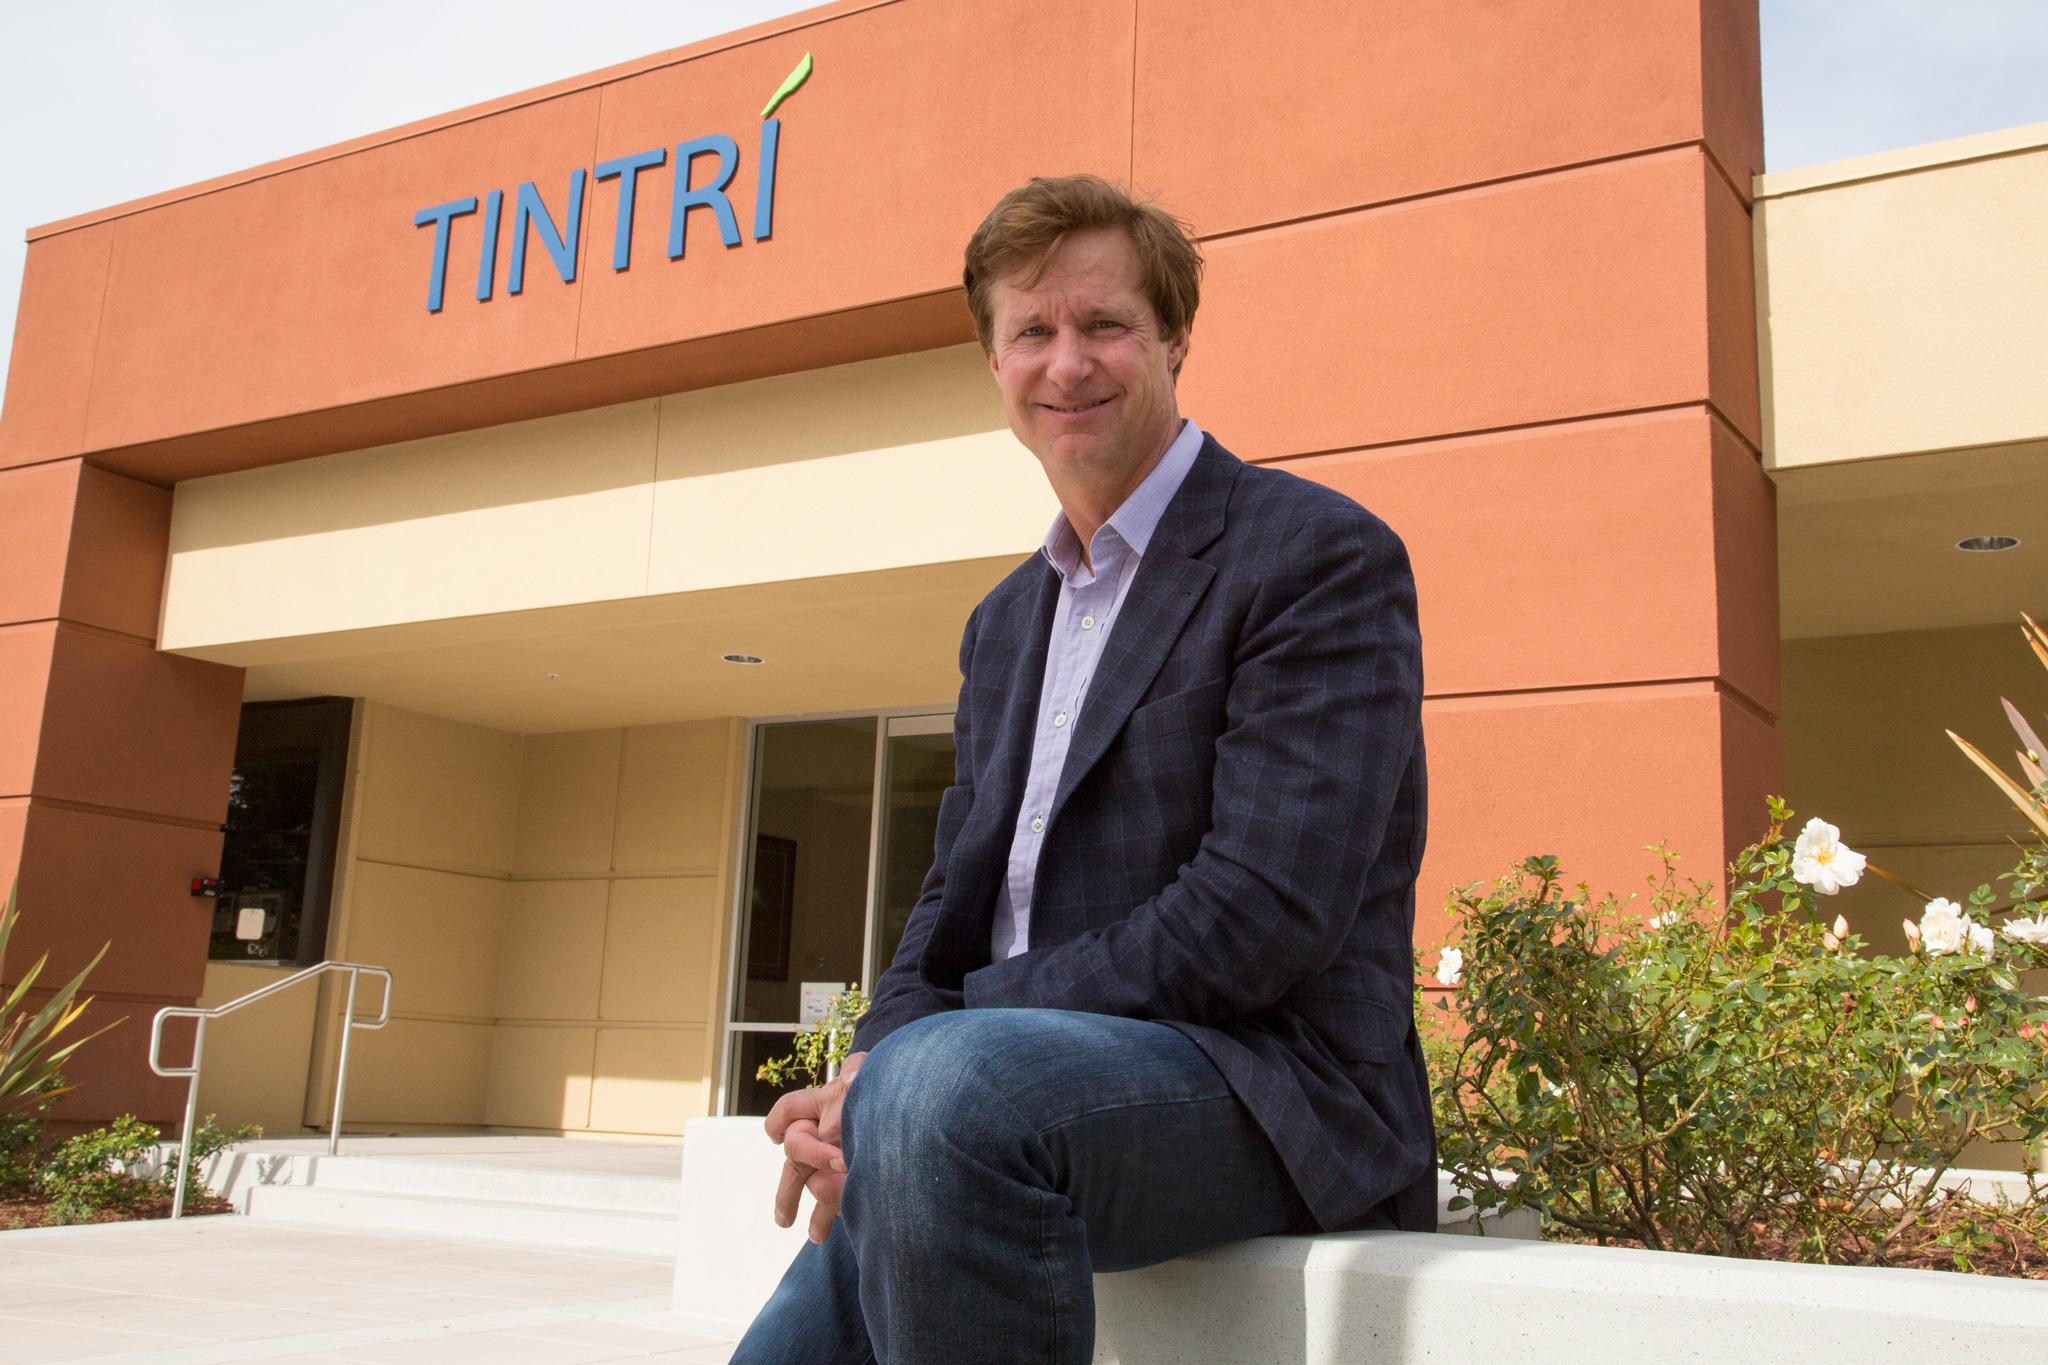 Tintri CEO Ken Klein